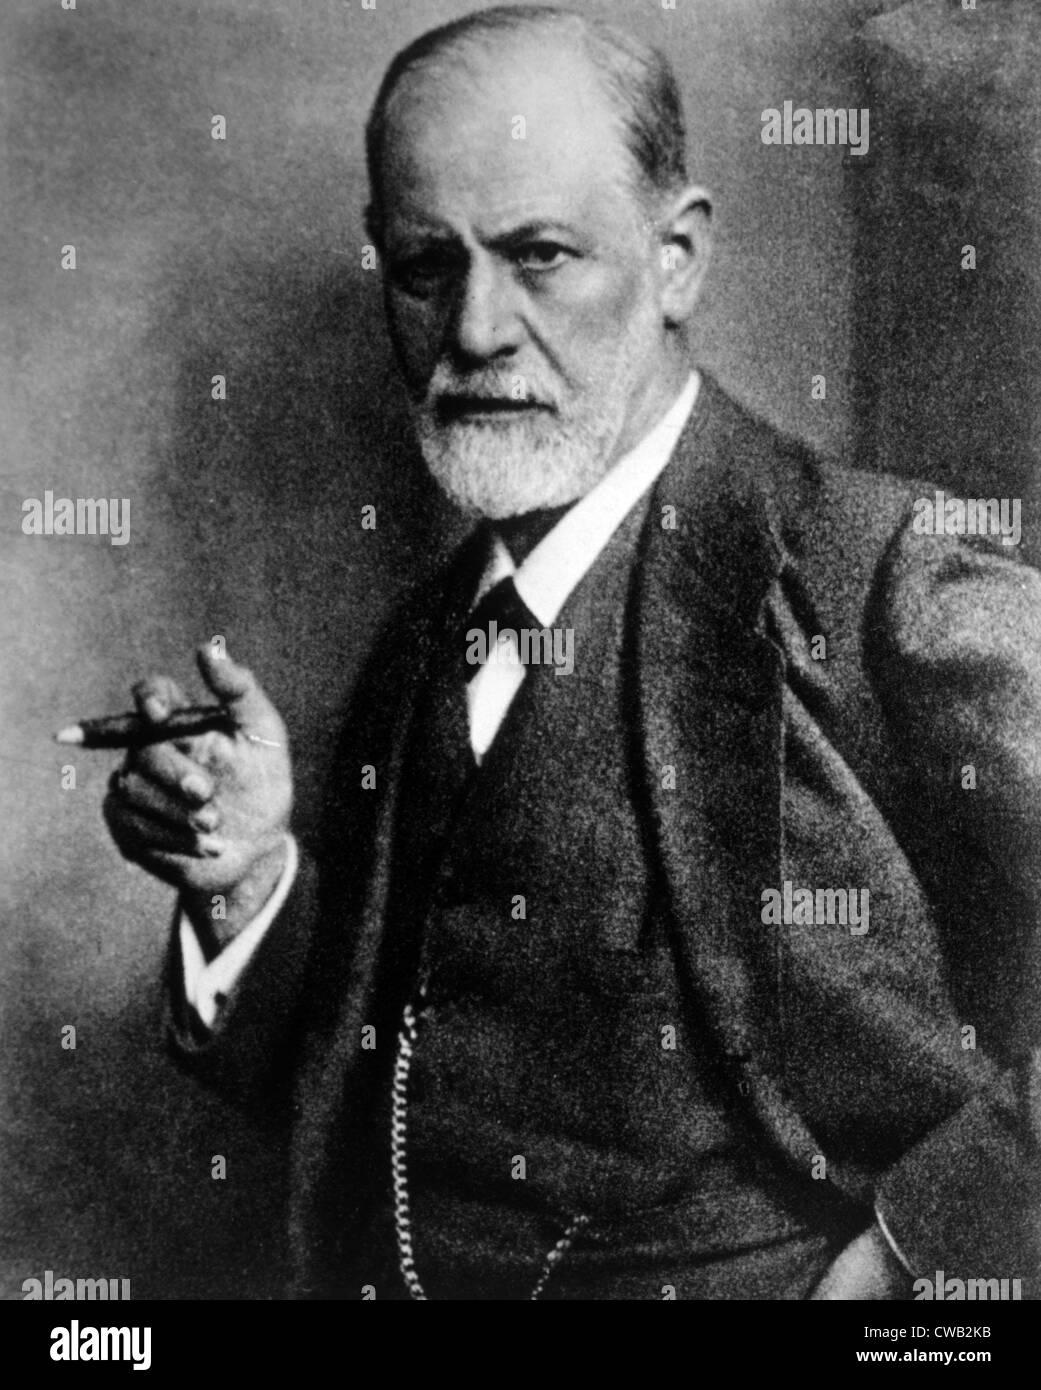 Sigmund Freud (1856-1939), photograph by Max Halberstadt, ca. 1921 - Stock Image